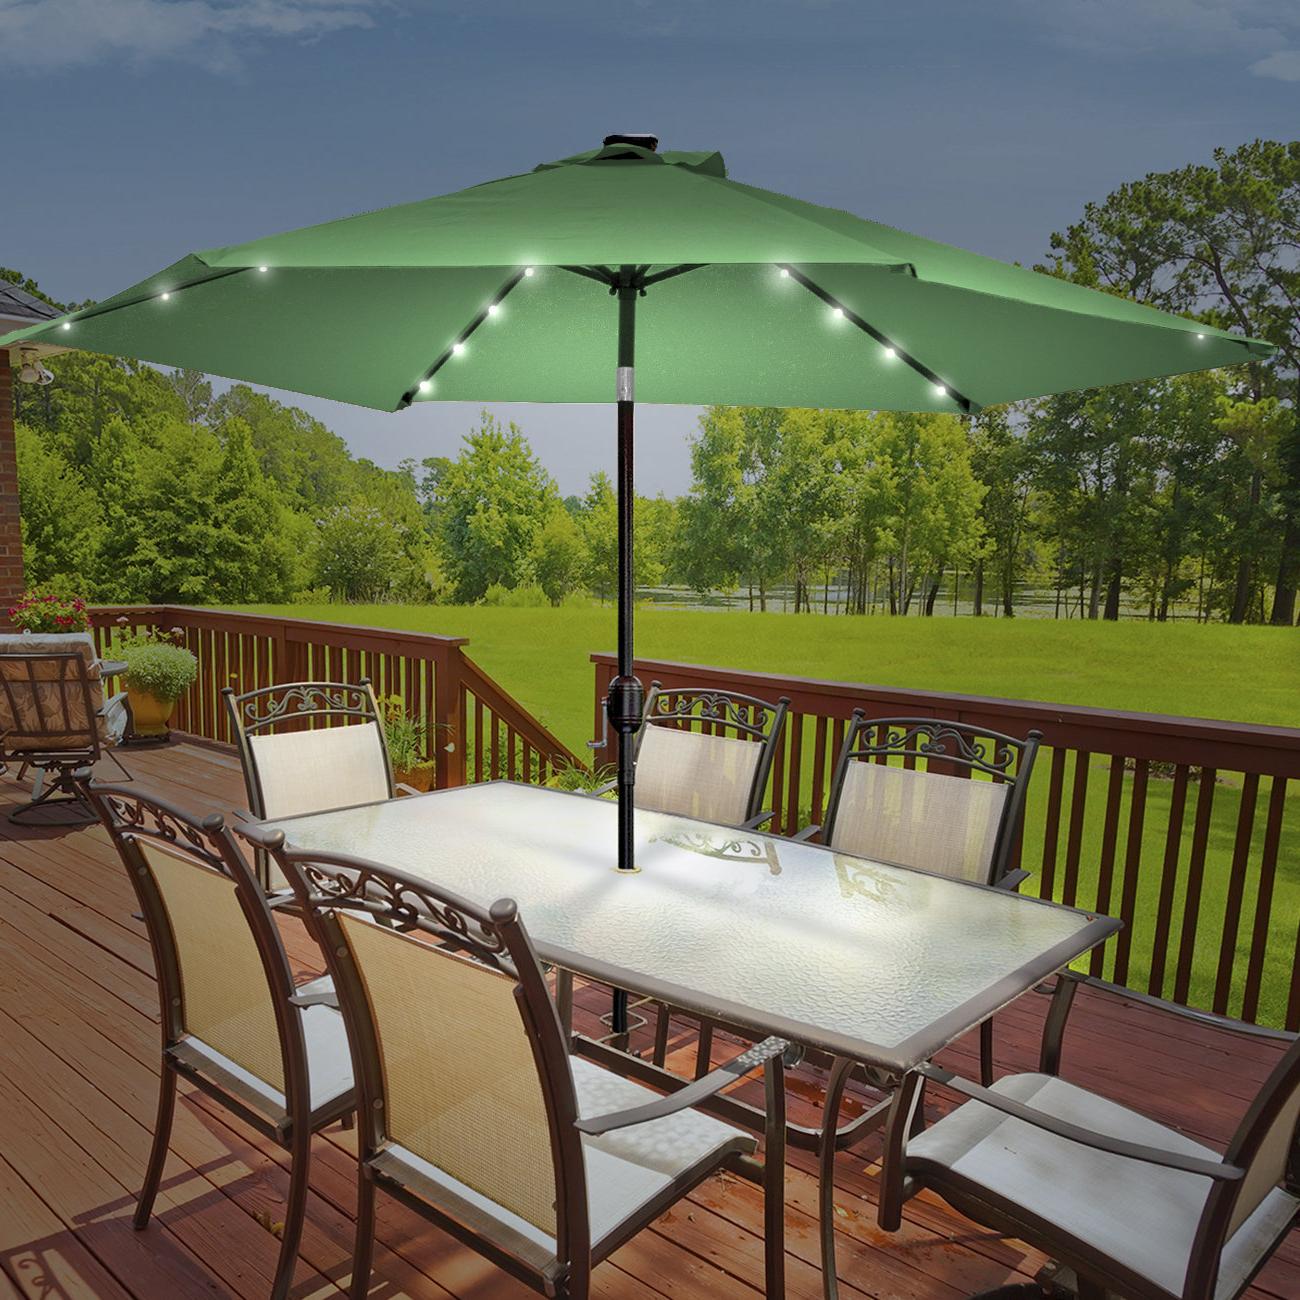 Rahate Solar Led Outdoor 10' Market Umbrella With Regard To 2020 Lonoke Patio Rectangular Market Umbrellas (View 14 of 20)